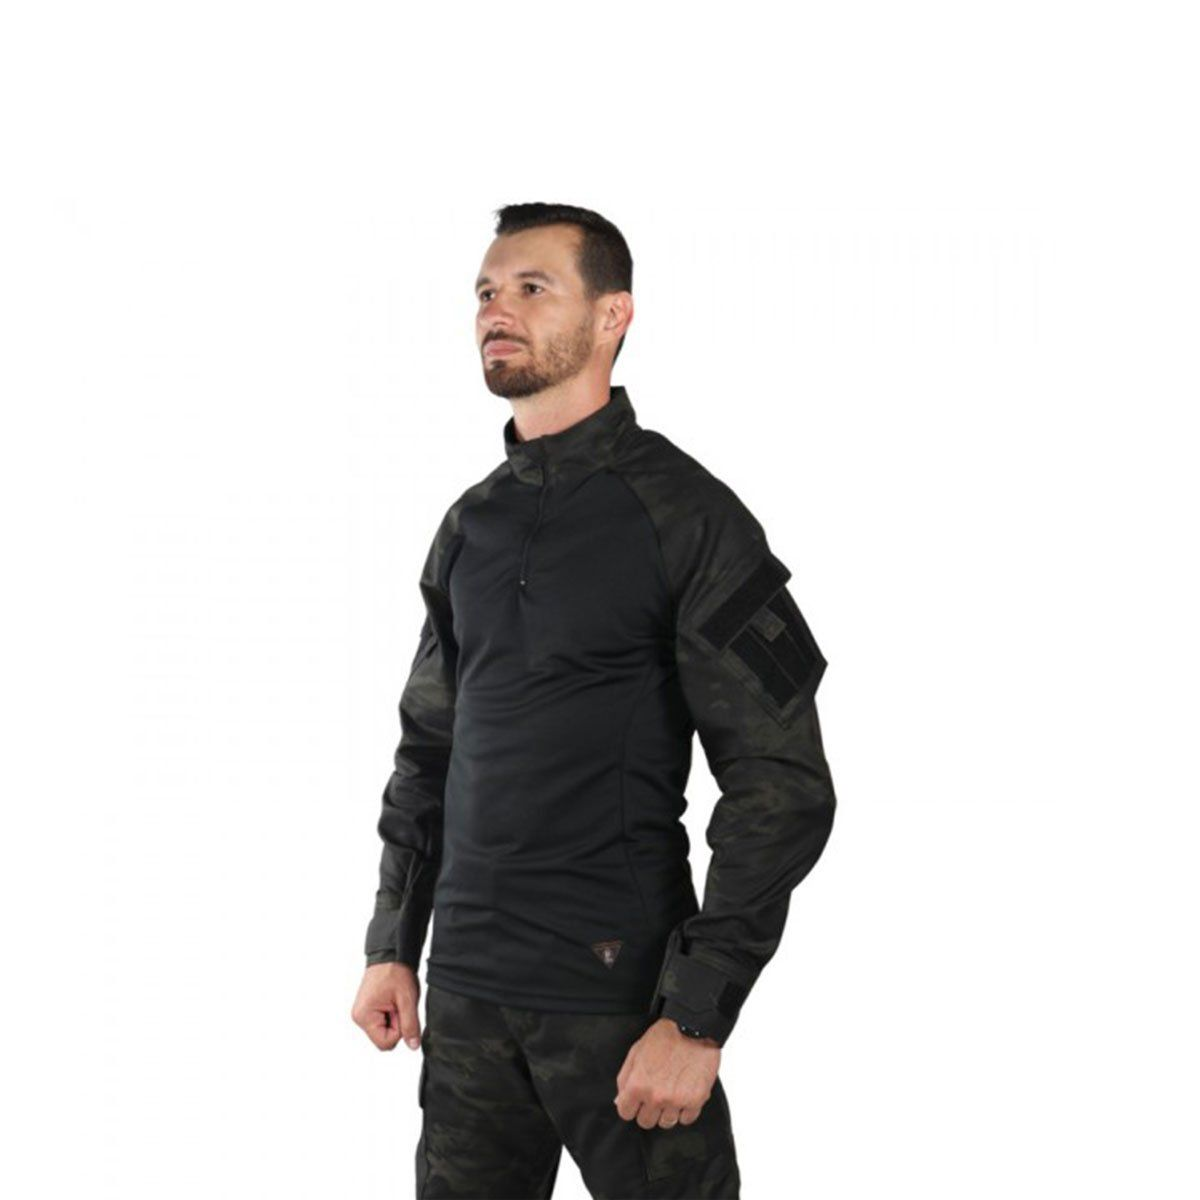 Combat Shirt Belica 70 Multicam Black